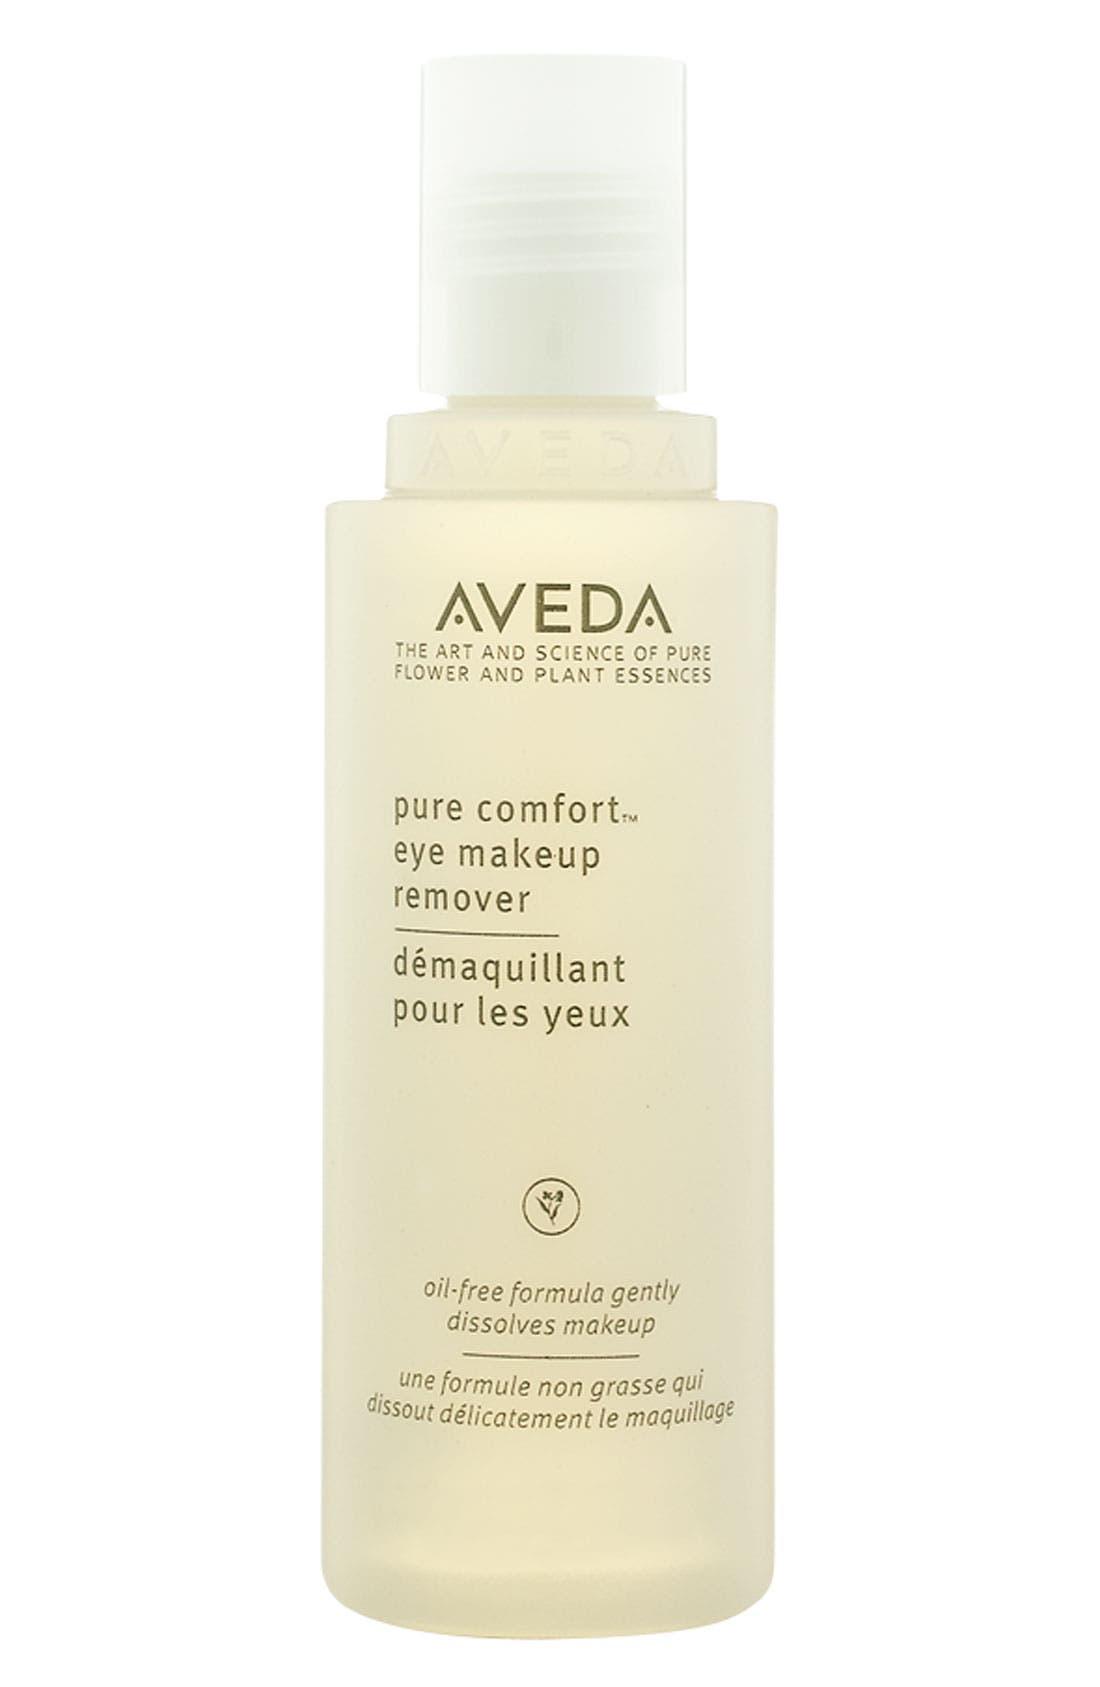 Aveda 'pure comfort™' Eye Makeup Remover